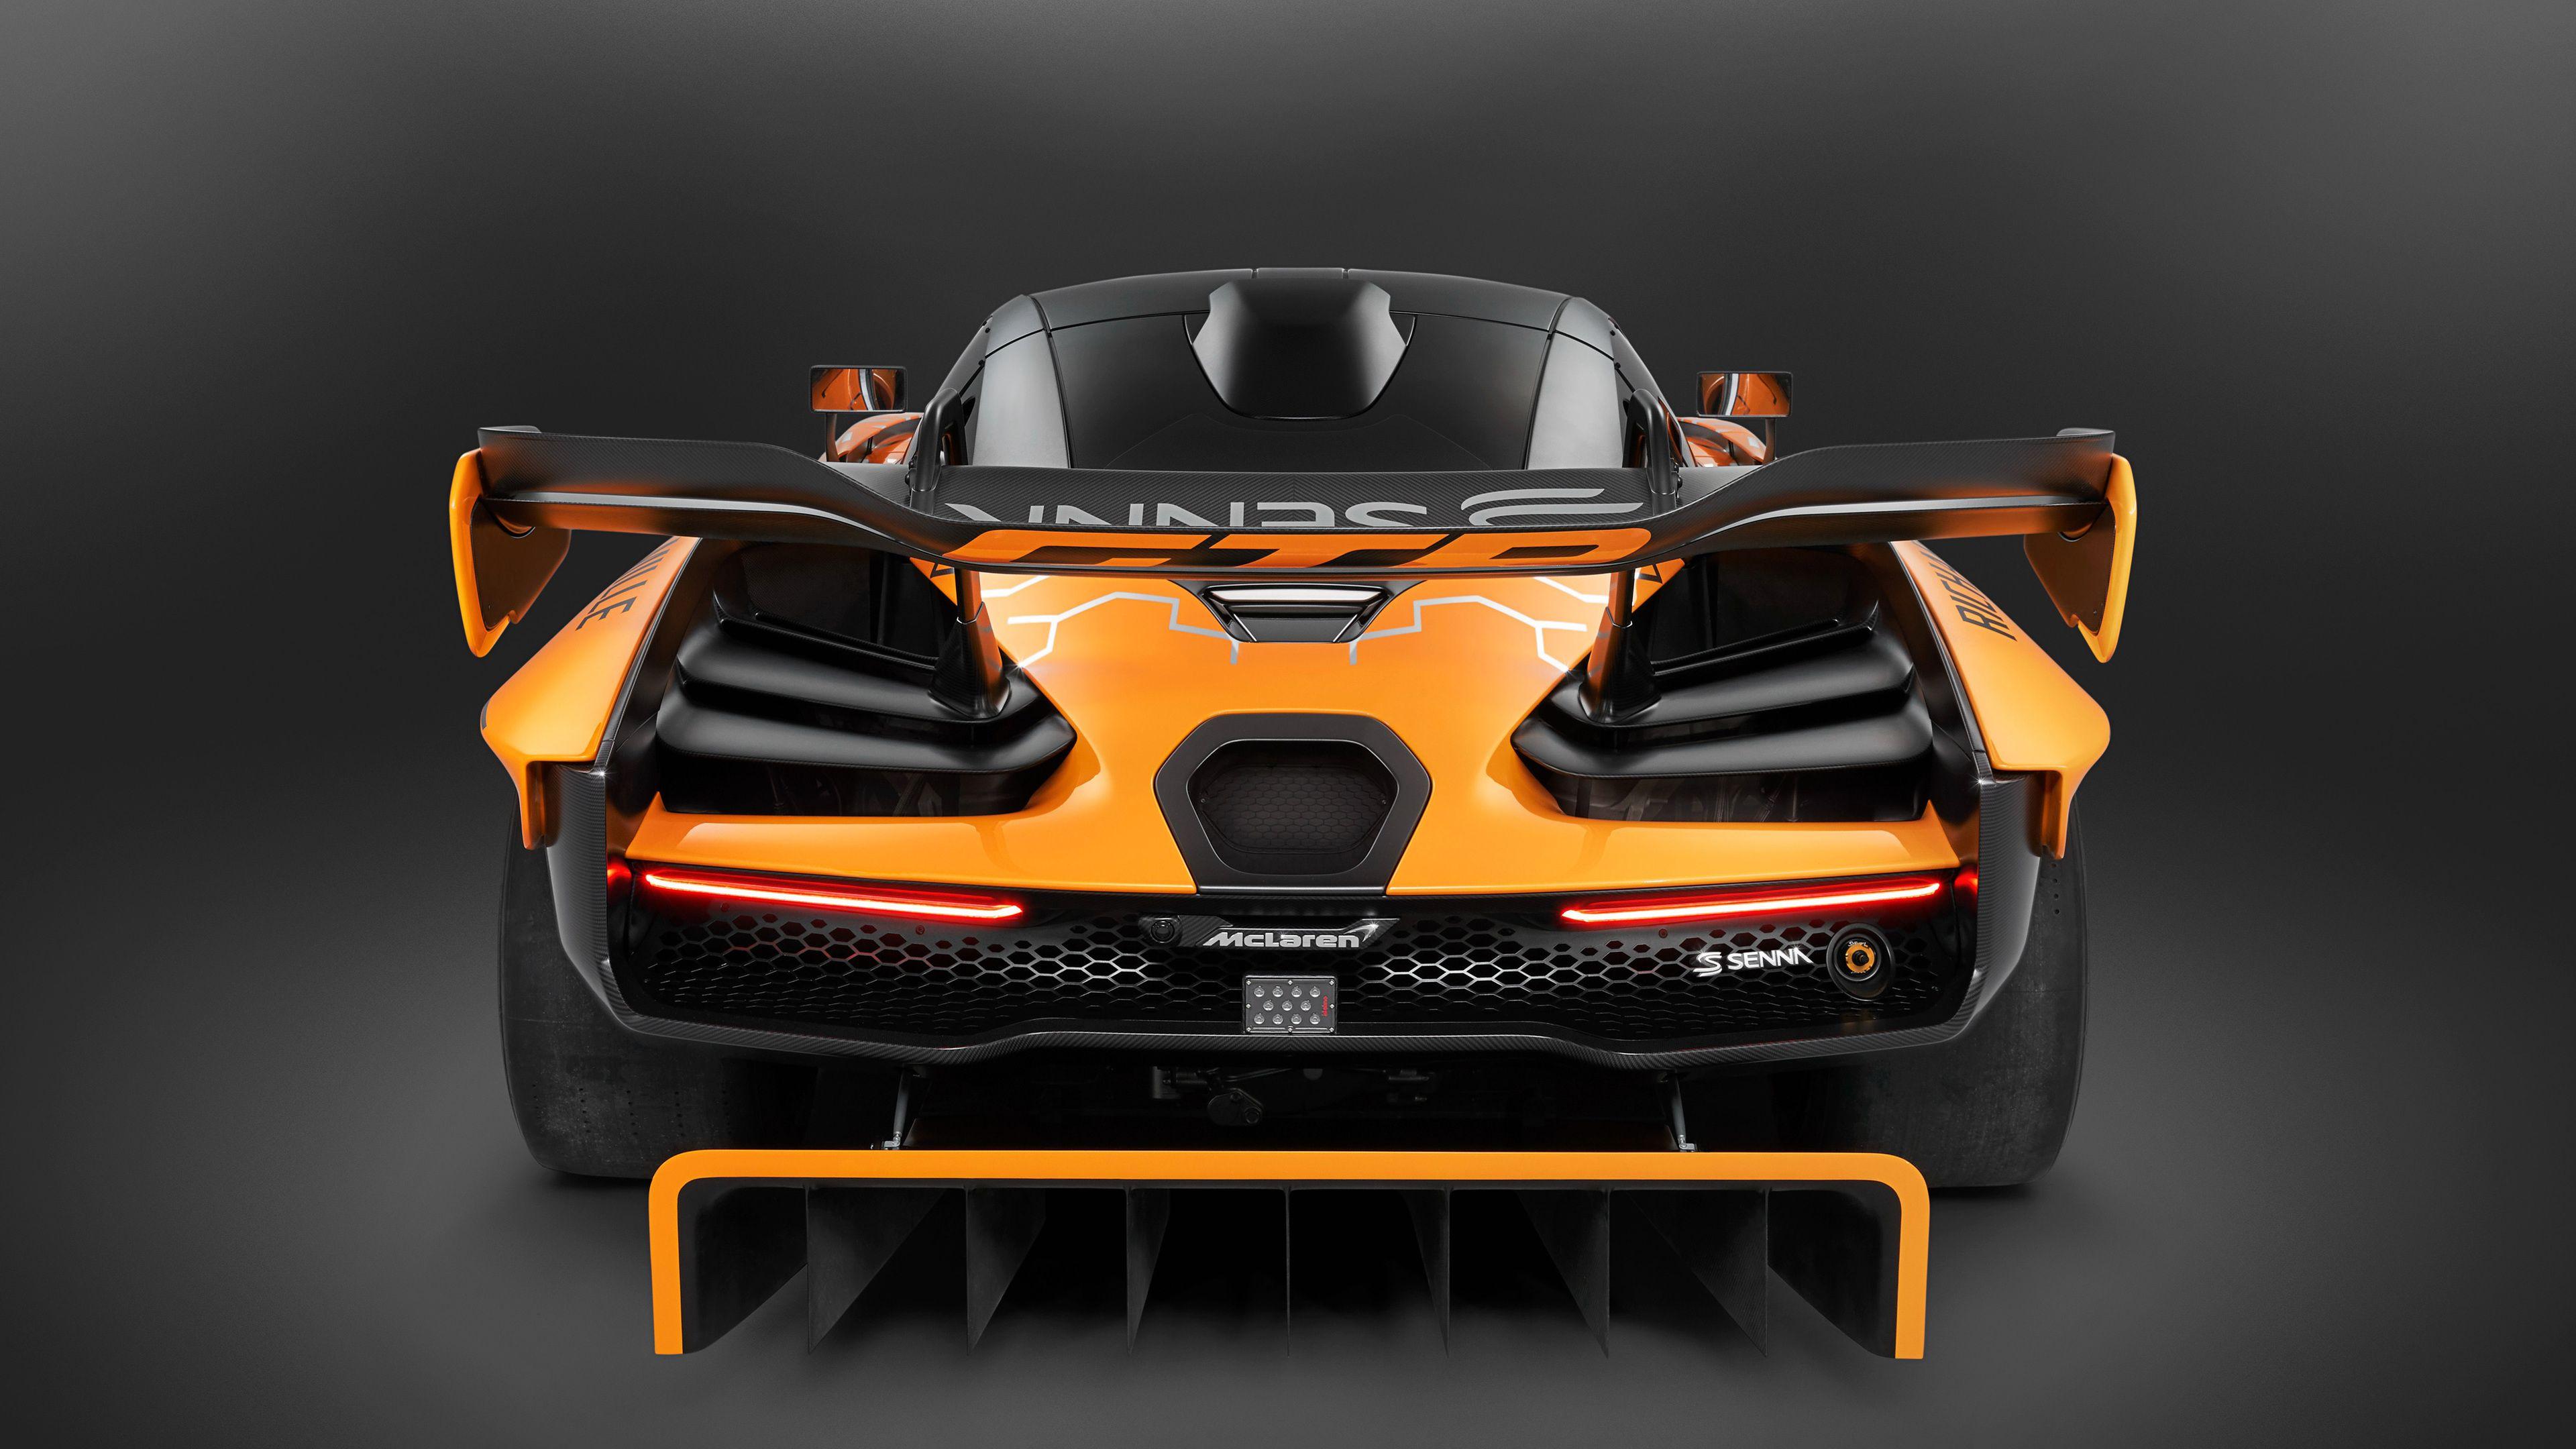 Super Sports Car Wallpaper Hd Car Wallpapers Id 2768 - HD3840×2160